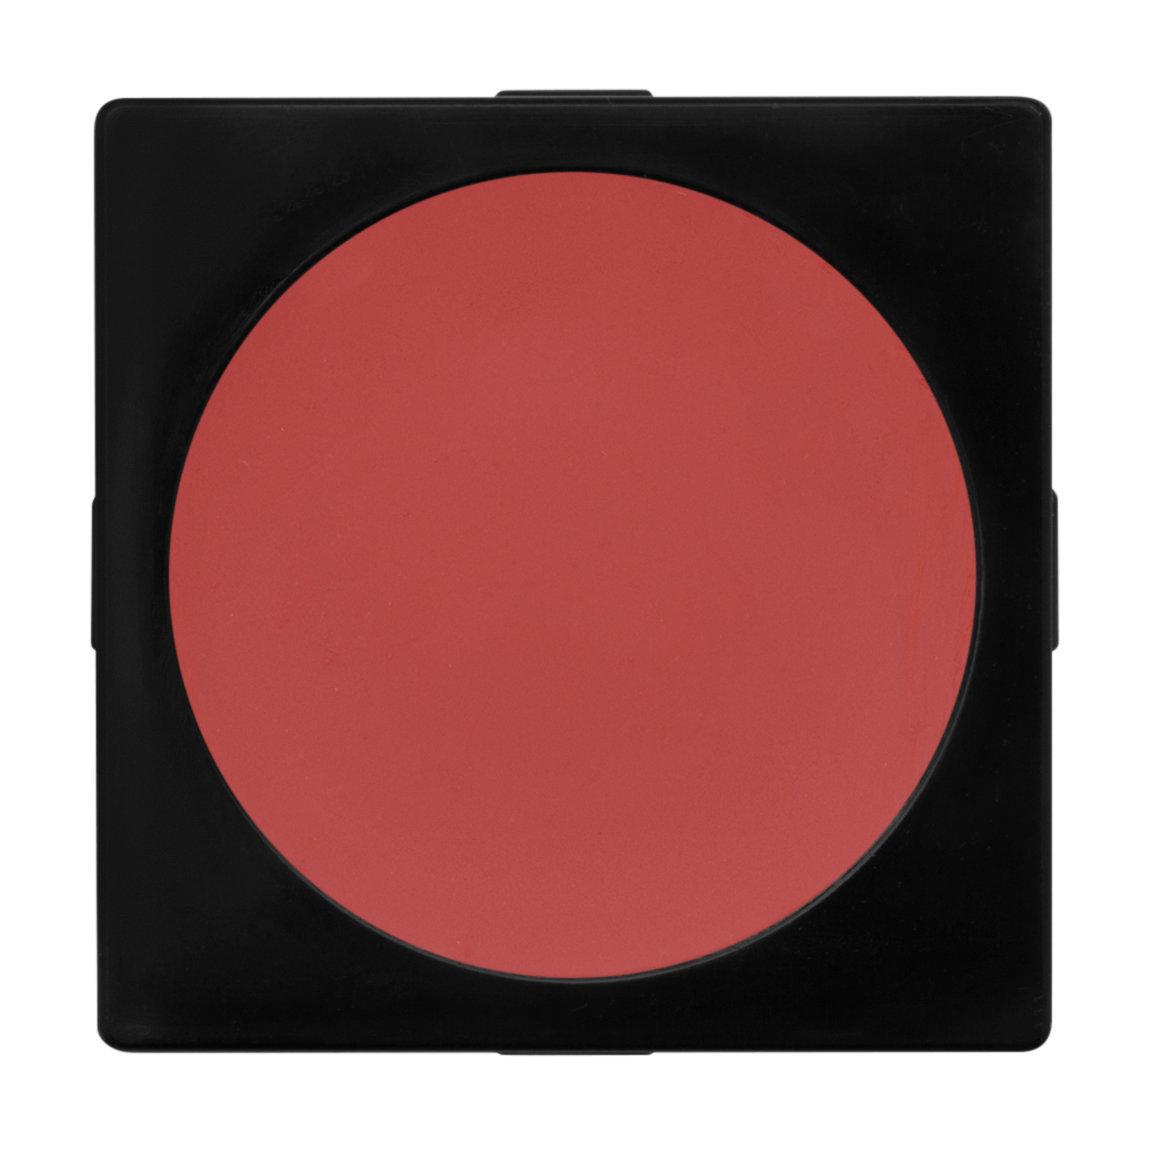 RCMA Makeup Godet Berry Bliss alternative view 1.